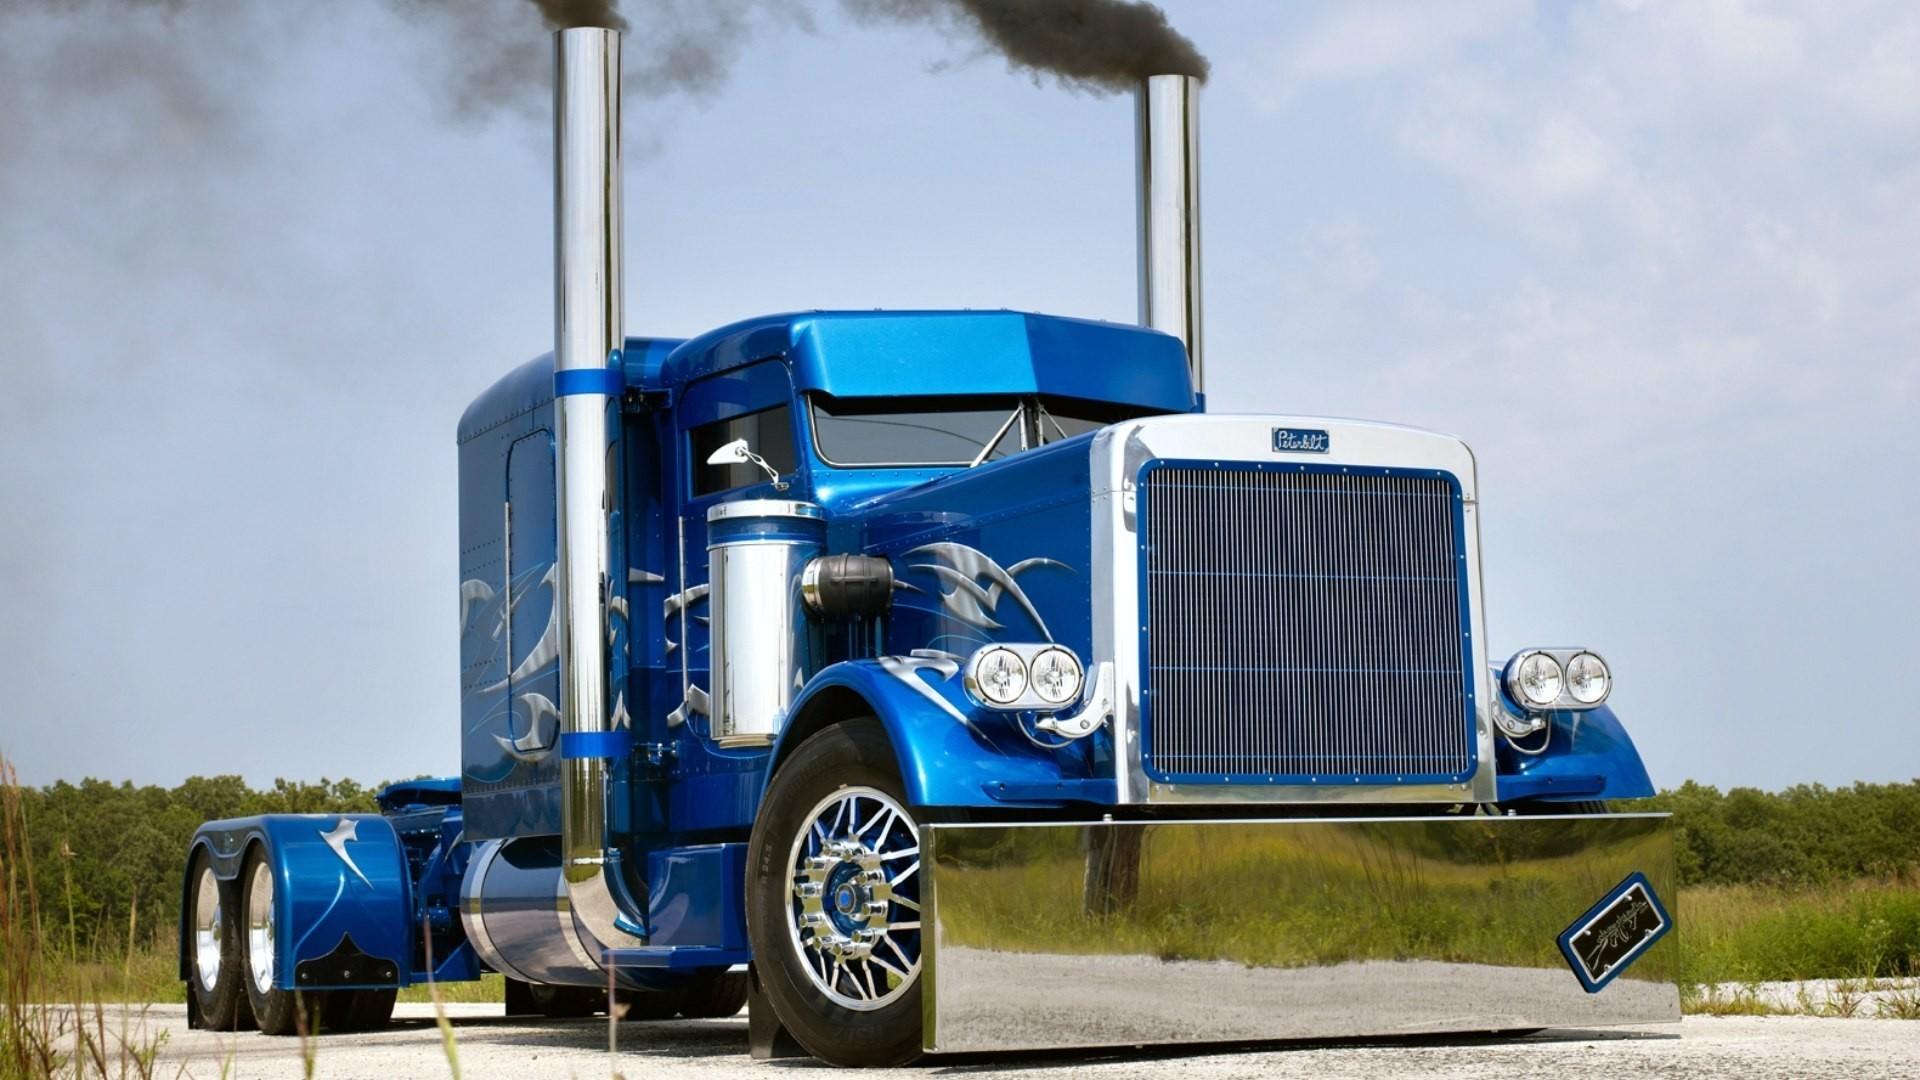 графика грузовик автомобиль без смс